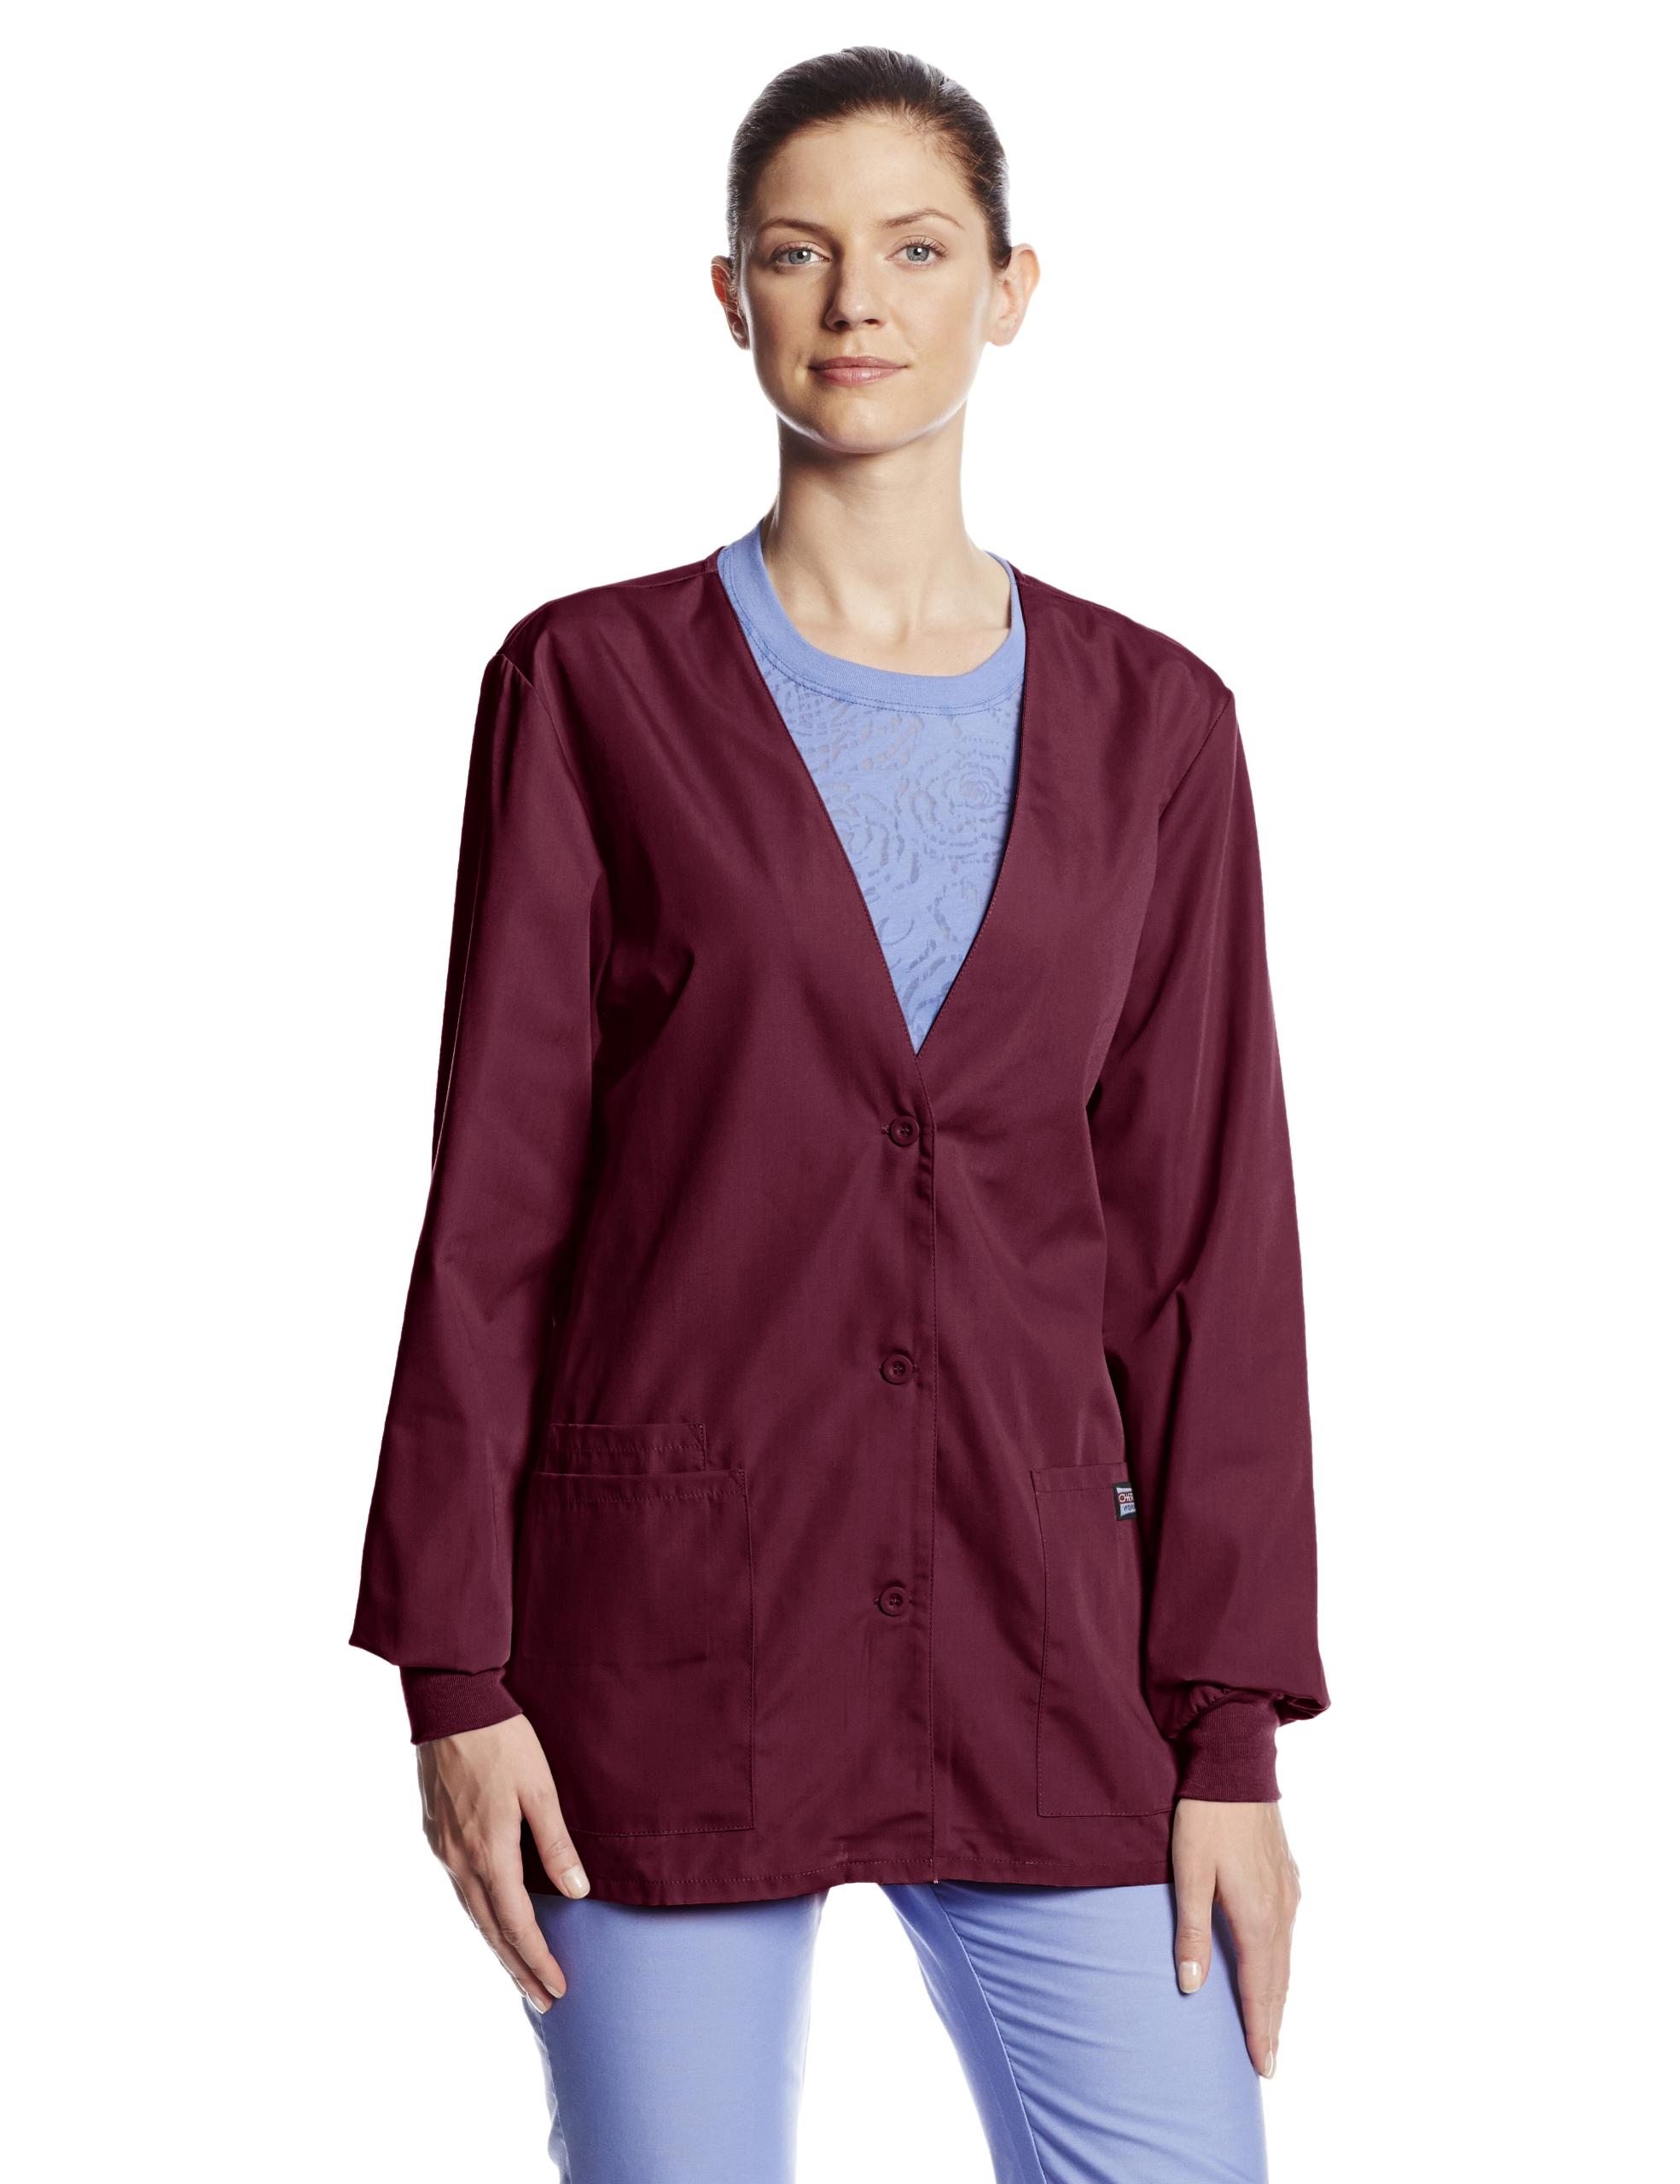 Cherokee Women's Workwear Scrubs Cardigan Warm-Up Jacket, Wine, 3X-Large